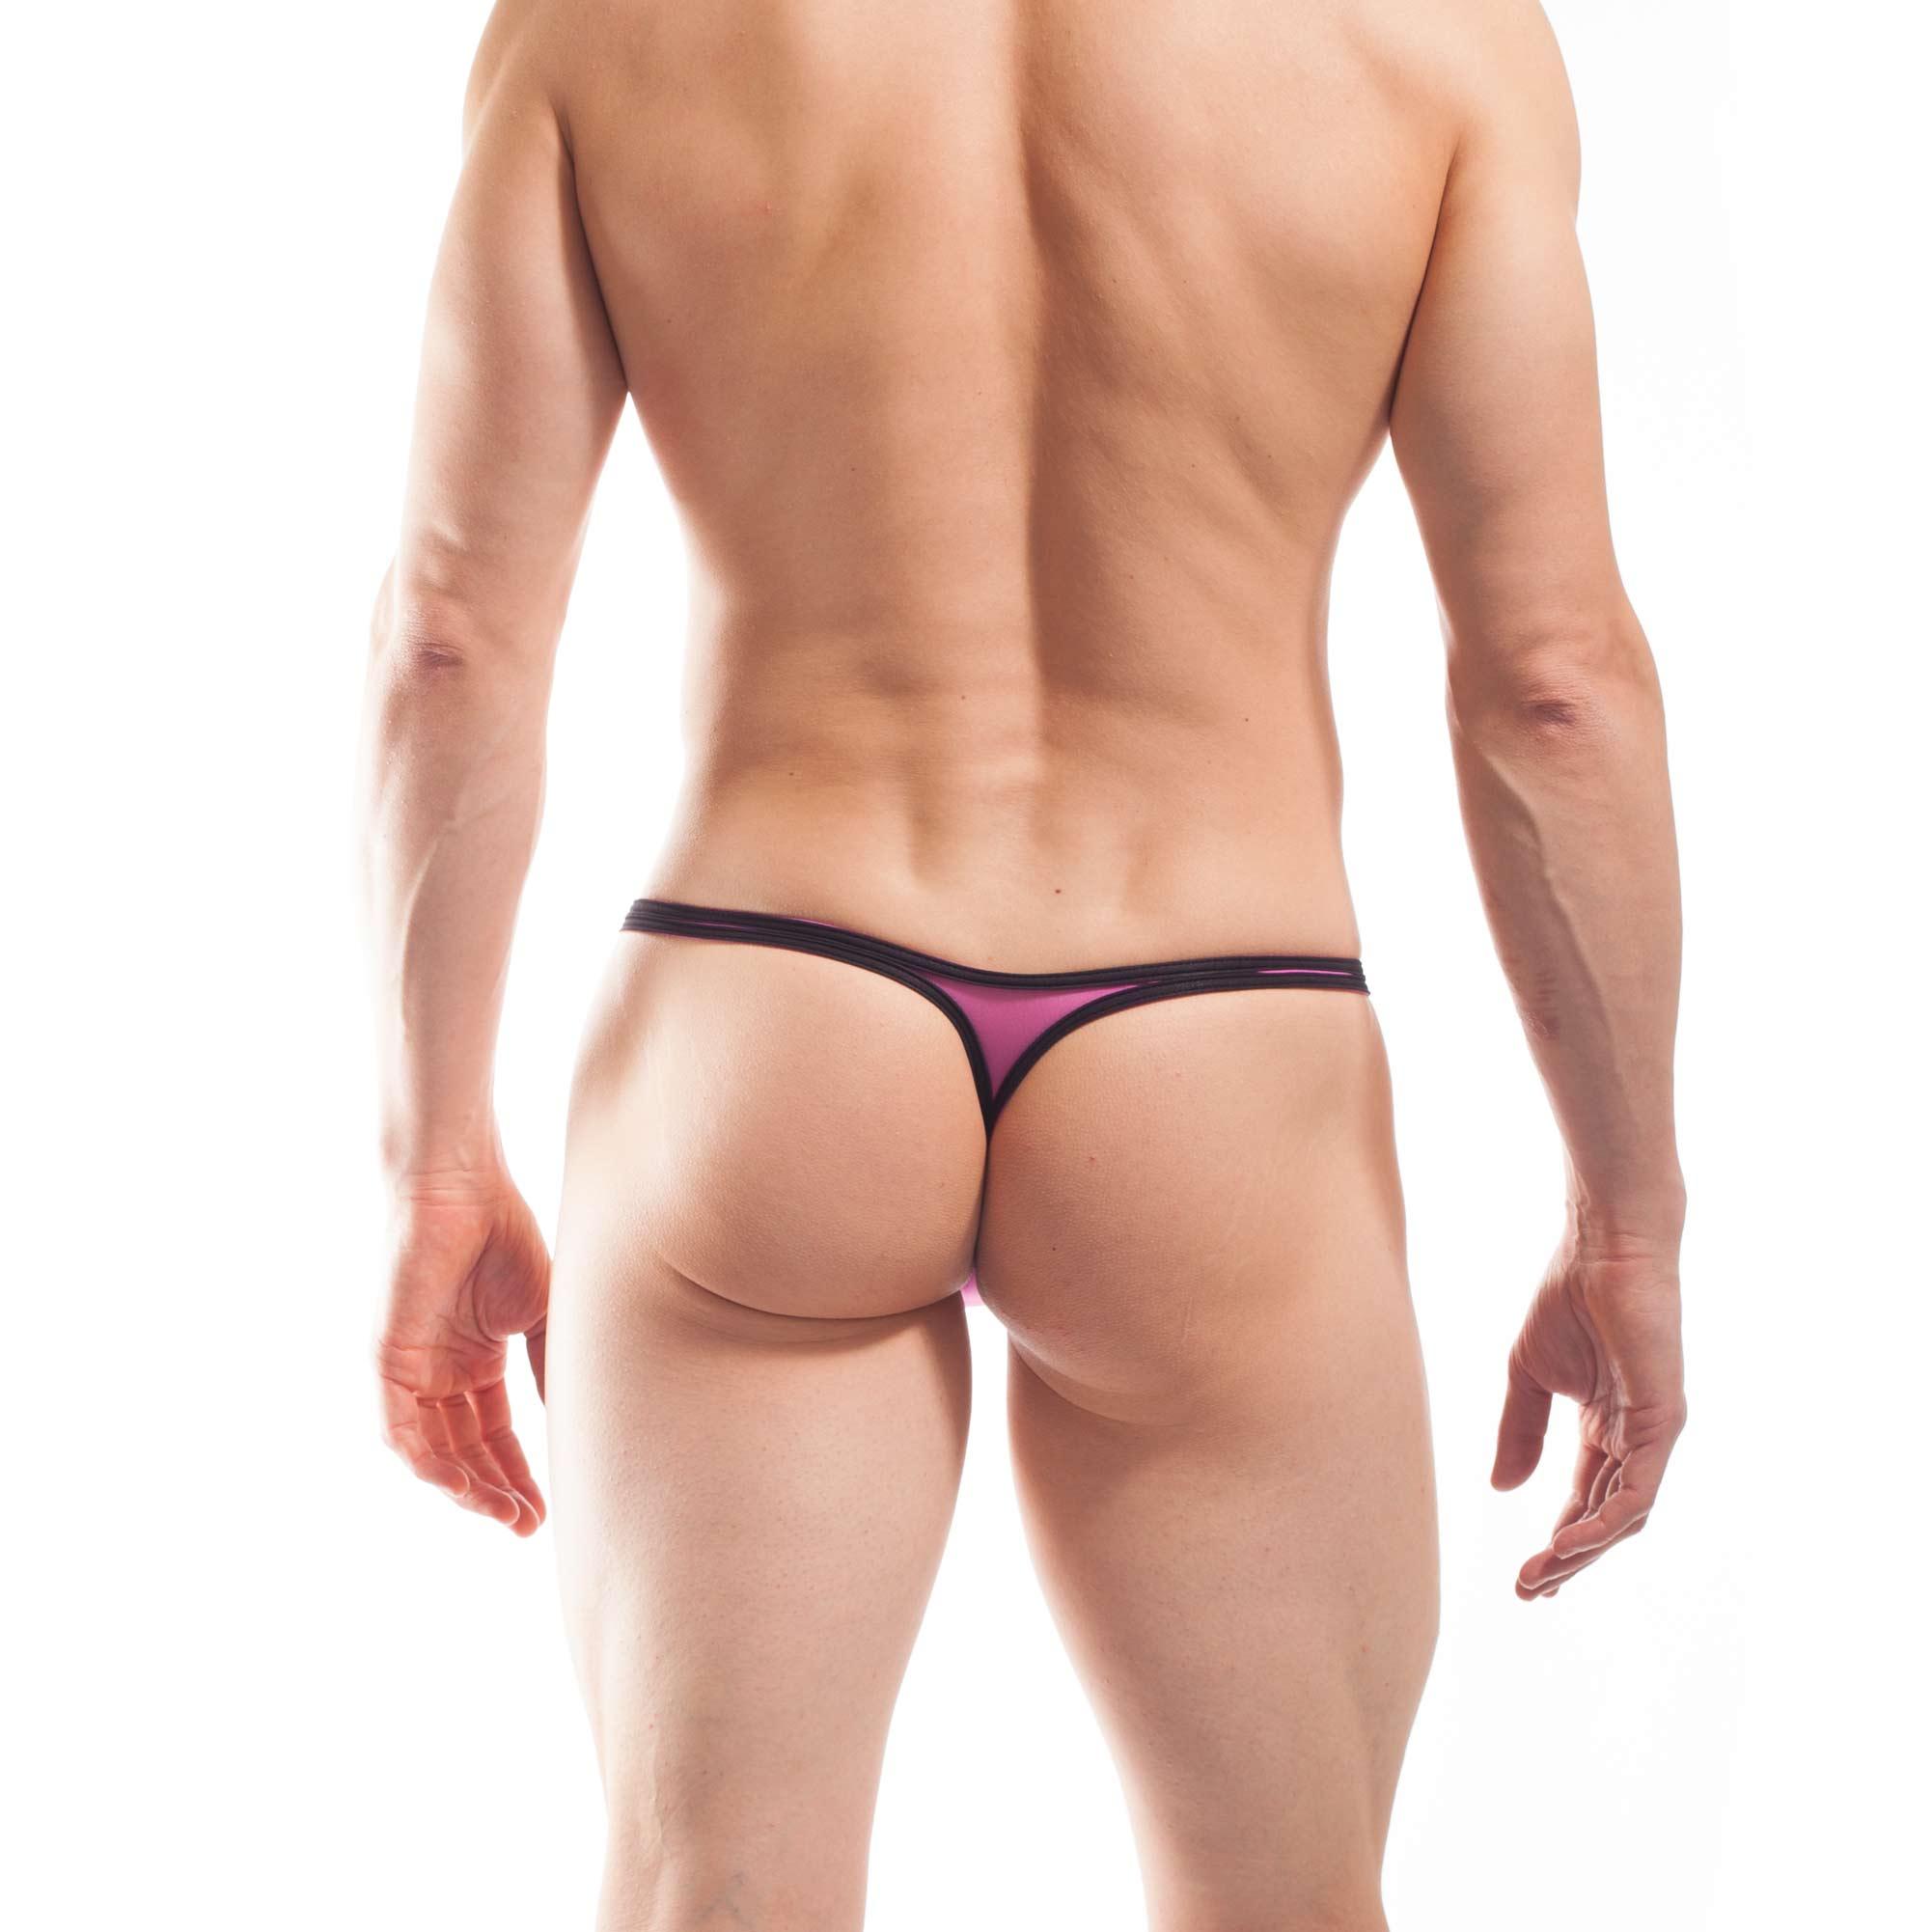 BEUN STRIPE PUSH UP MINI STRING, String, Tube, knappe Badehose, swim trunks, kontrast Ränder, schwarze Börtchen, candy pink, feilchen lila